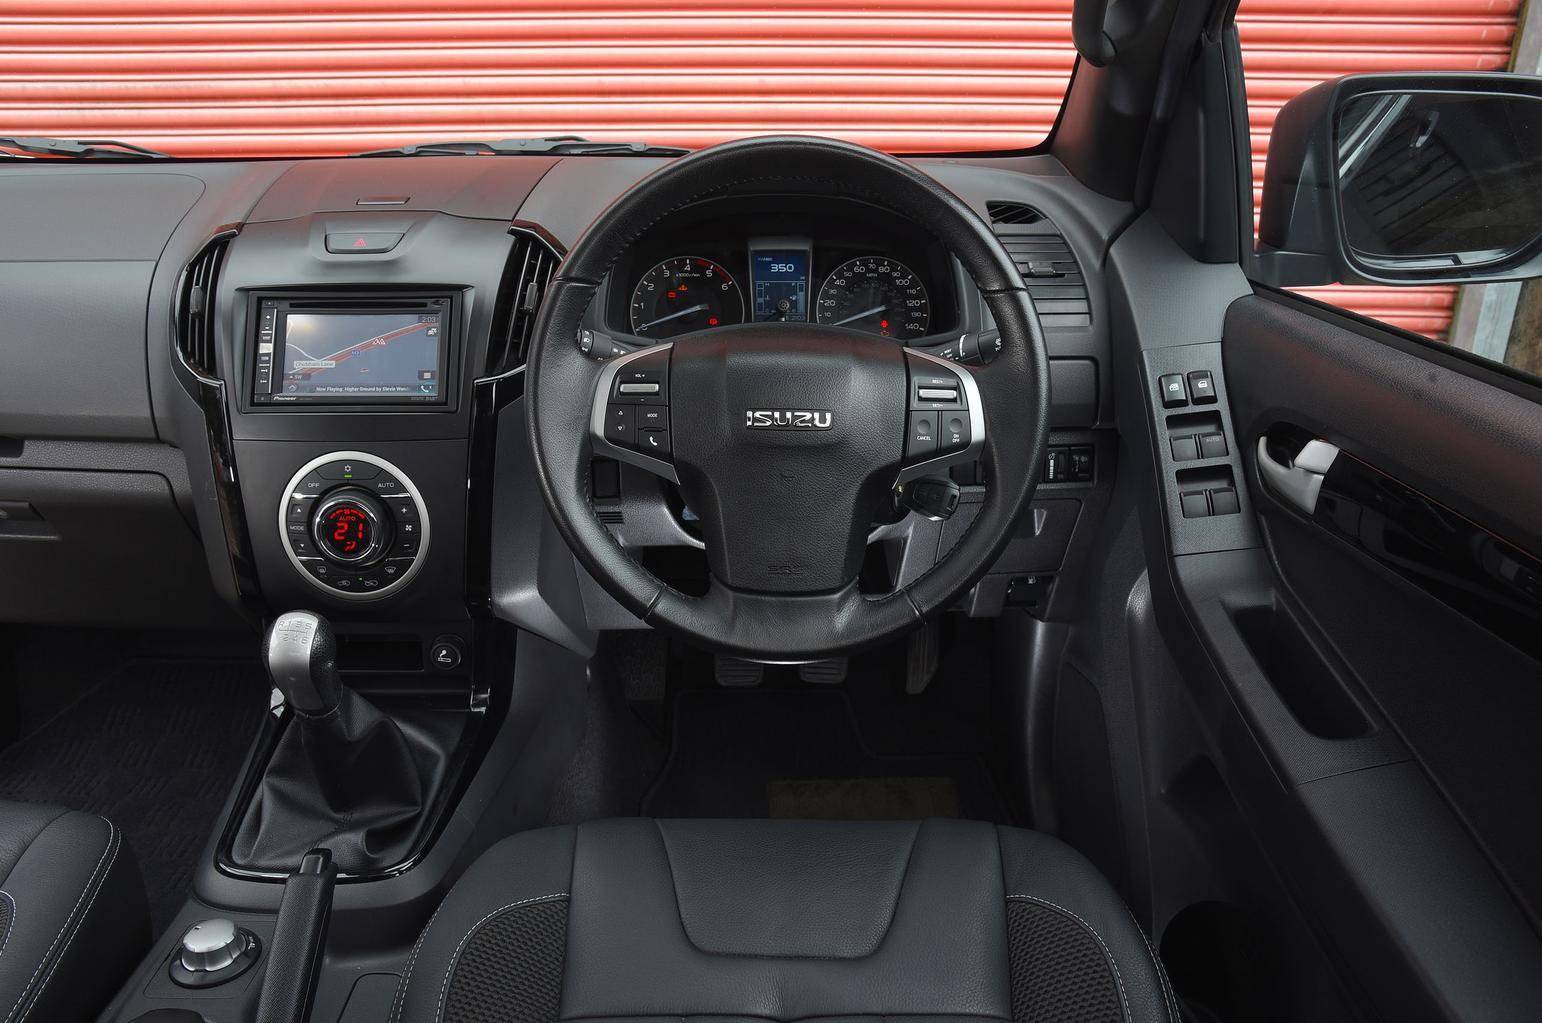 2016 Isuzu D-Max Double Cab review